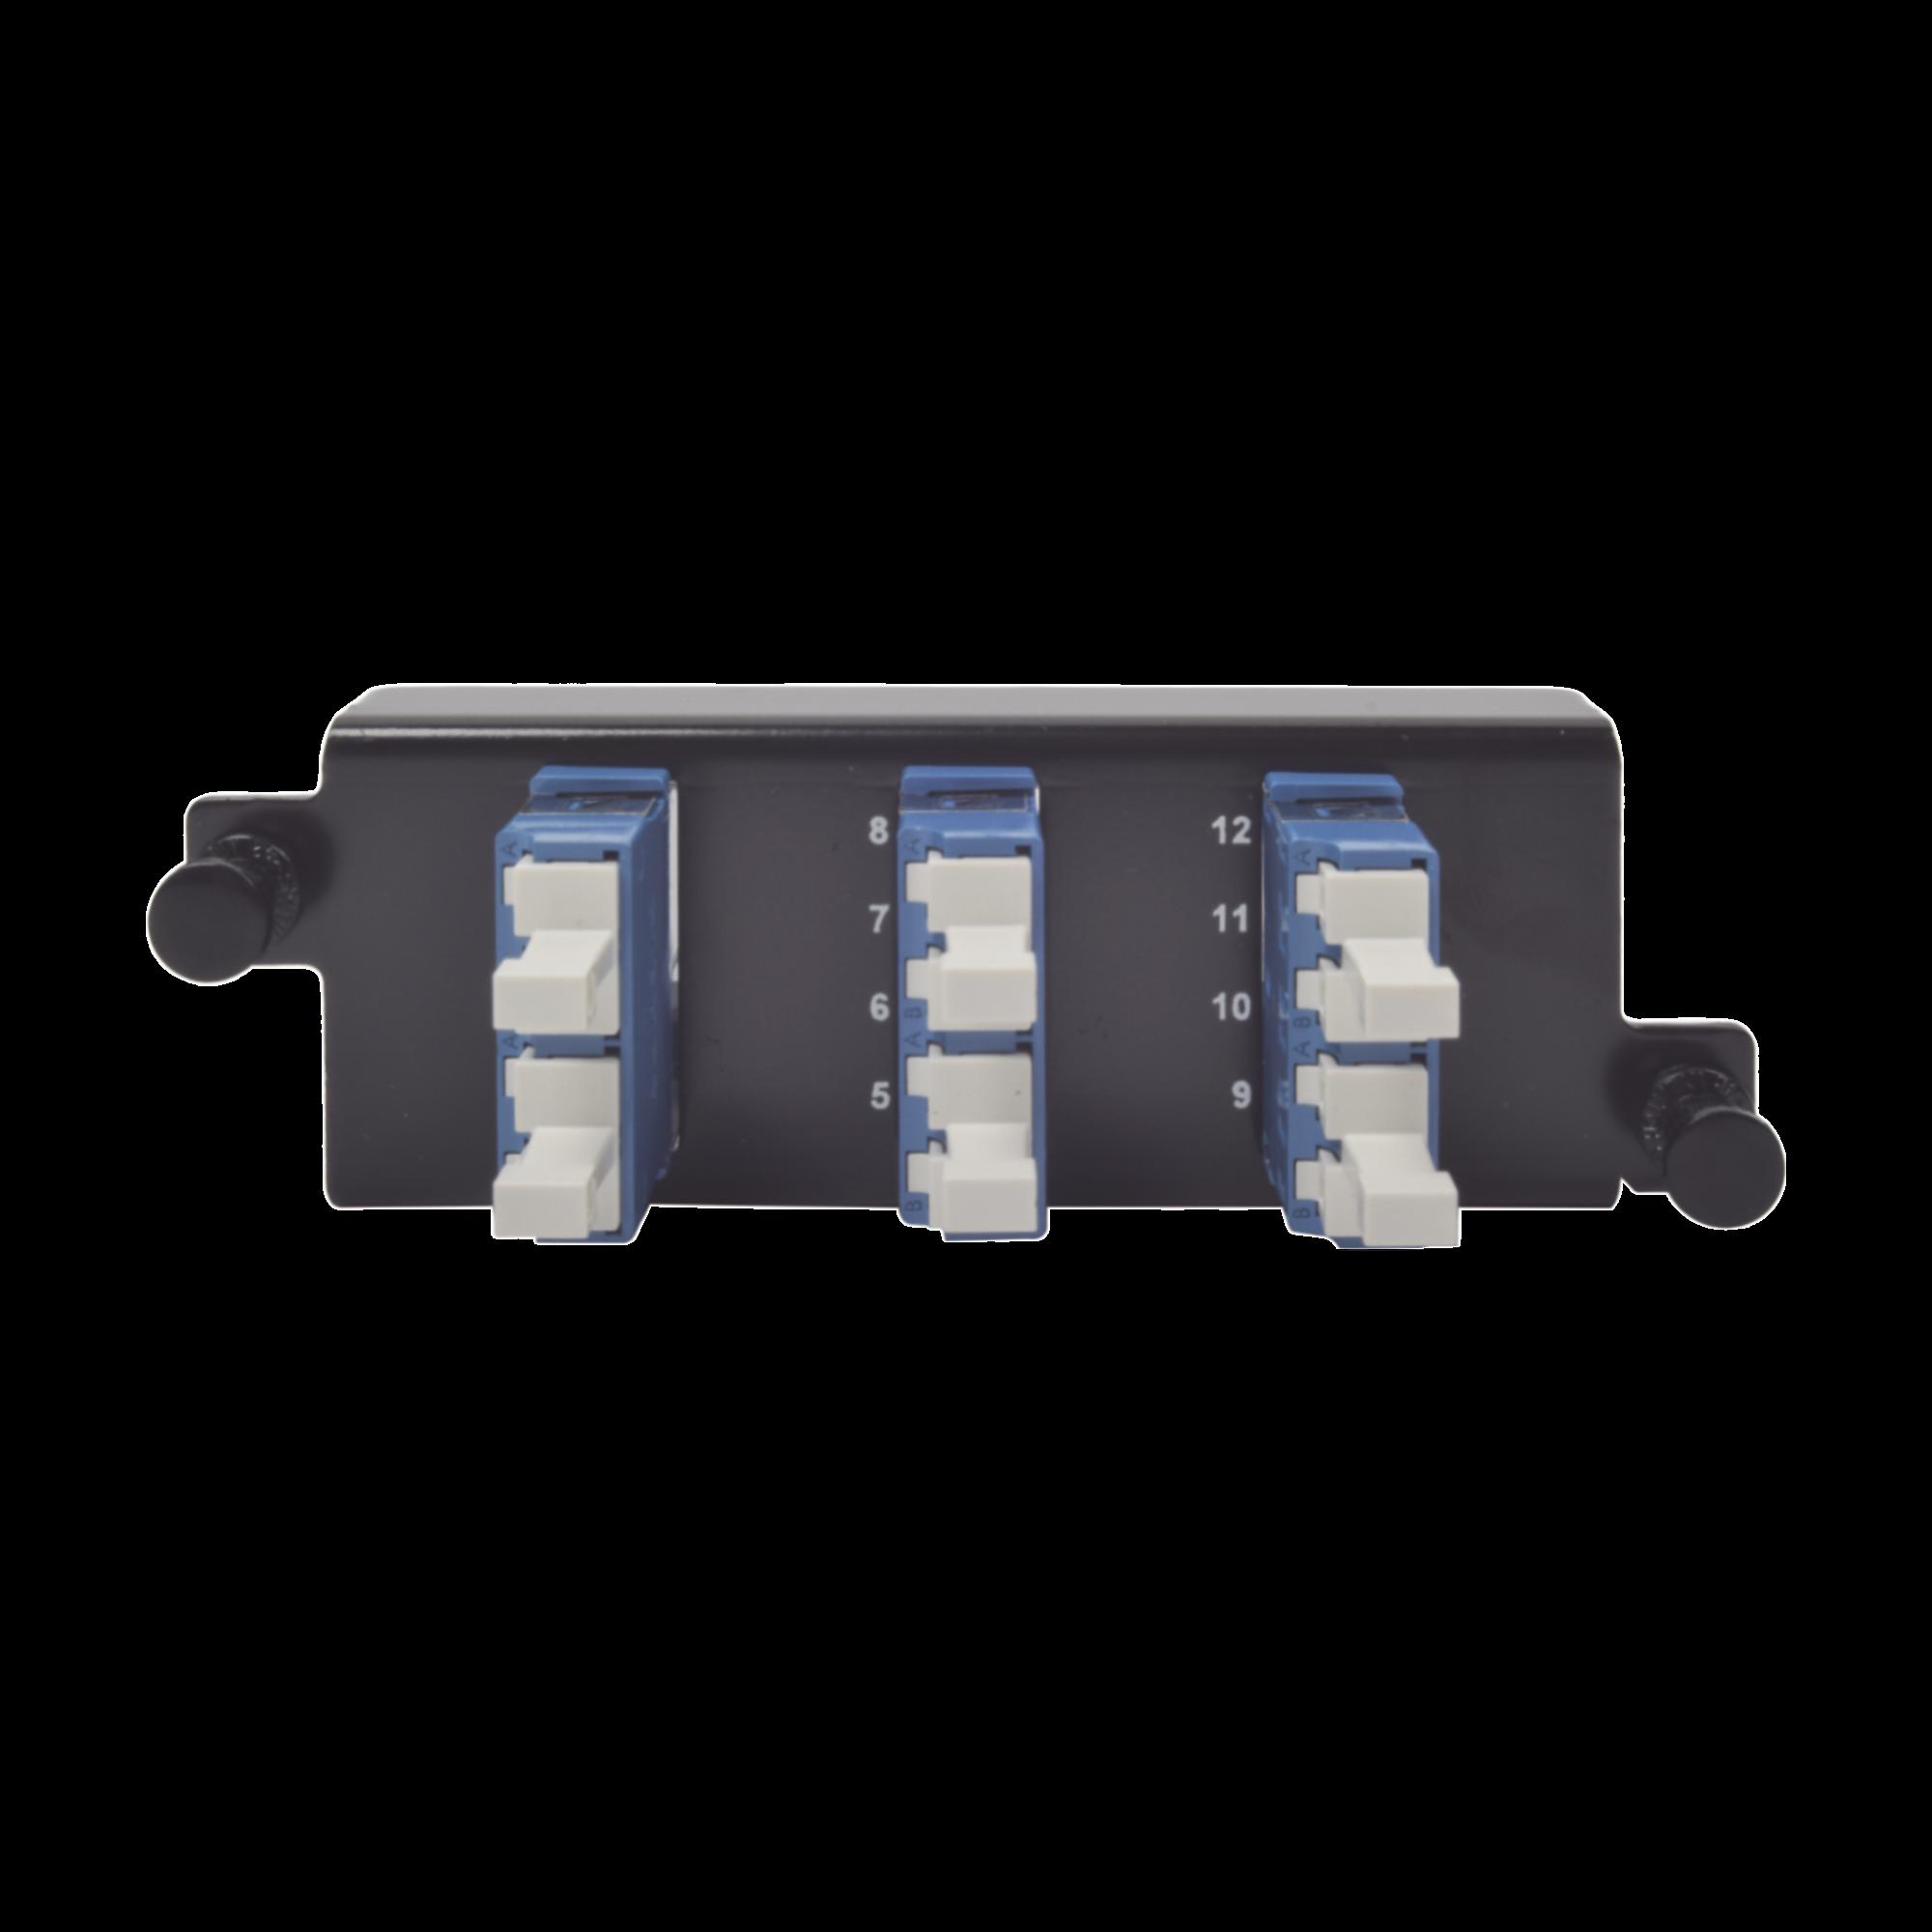 Placa acopladora de Fibra óptica Plug and Play, Con 6 Conectores LC Duplex (12 Fibras), Para Fibra Monomodo, Azul